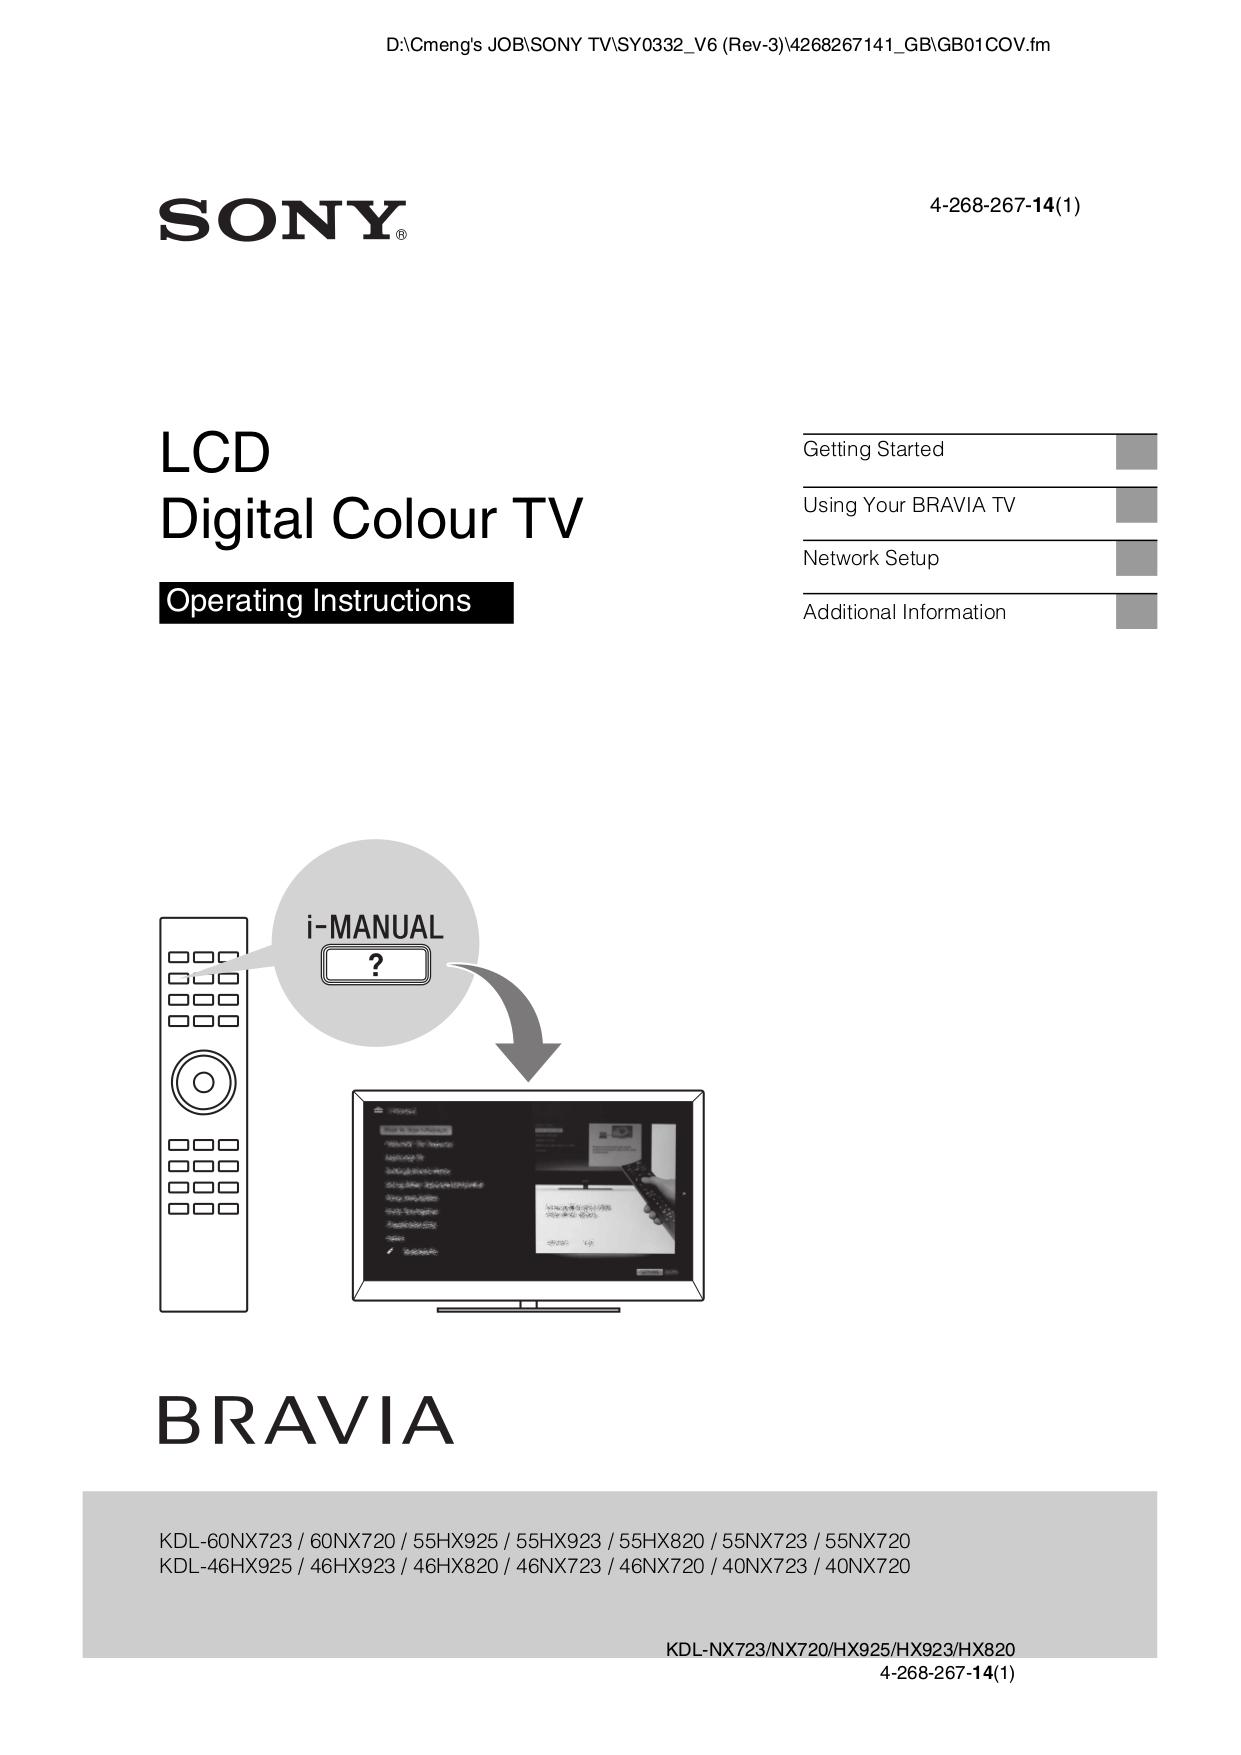 sony bravia lcd manual user guide manual that easy to read u2022 rh sibere co manual sony bravia kdl-40w5500 manual sony bravia 40w605b